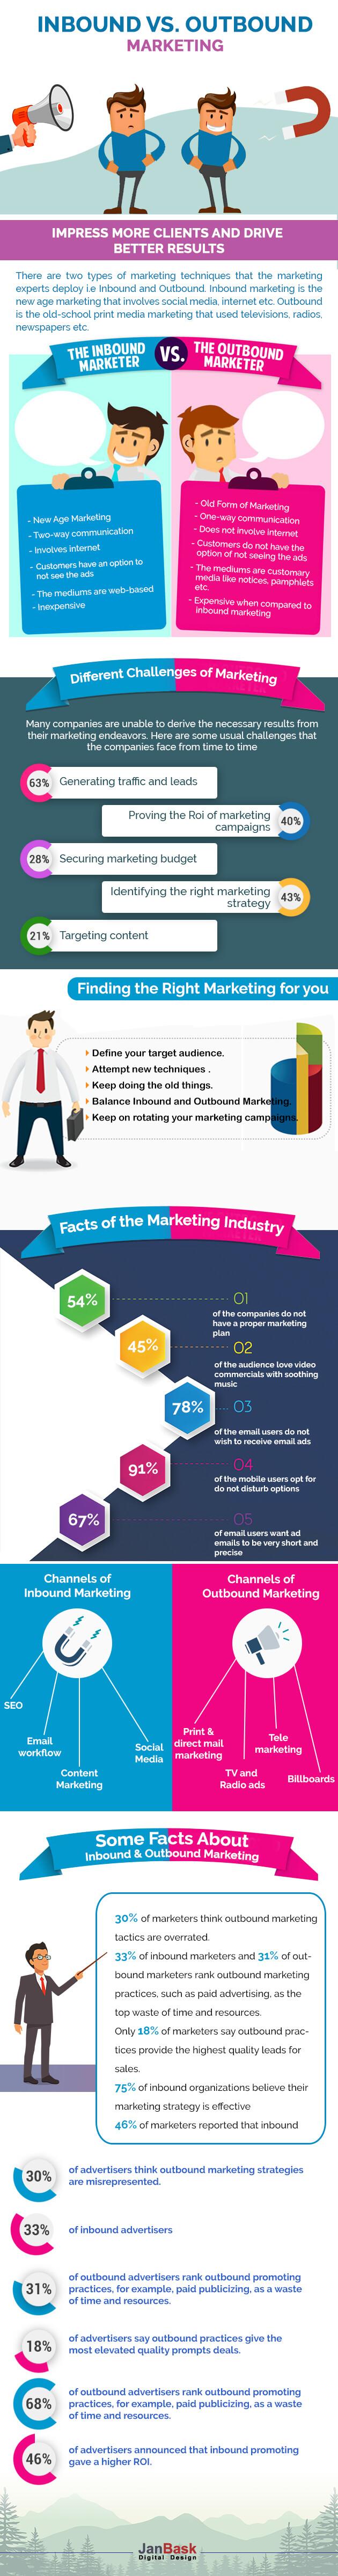 InfographicInbound Marketing vs. Outbound Marketing